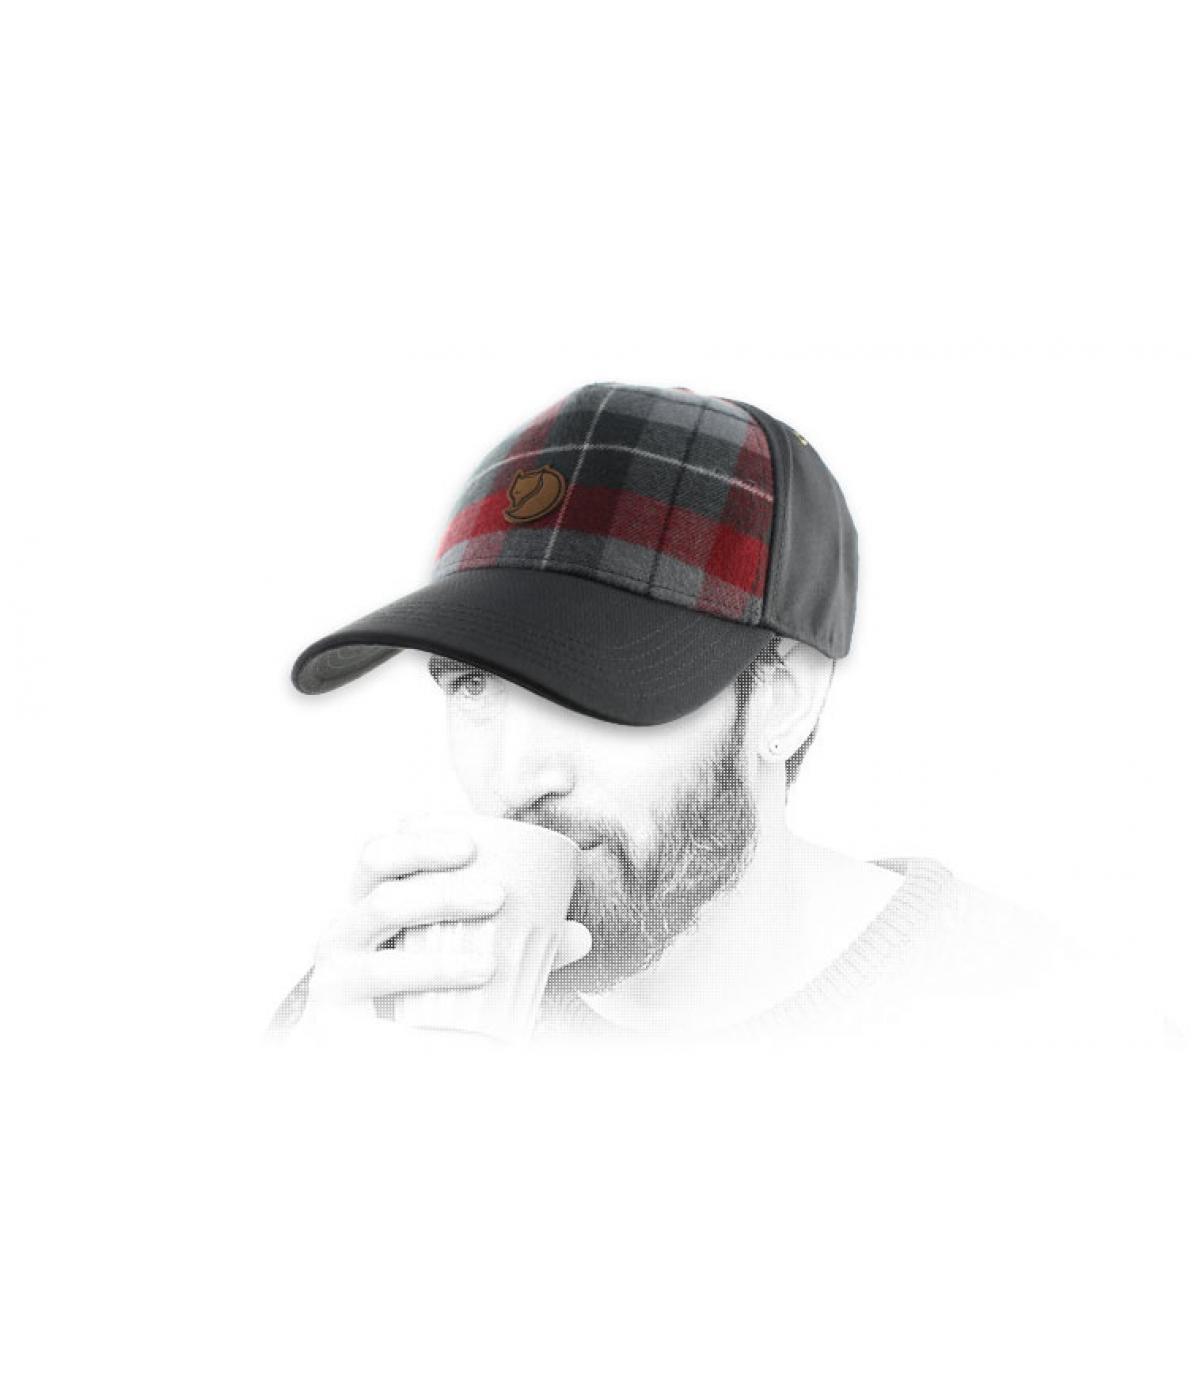 gris curva de gorra a cuadros